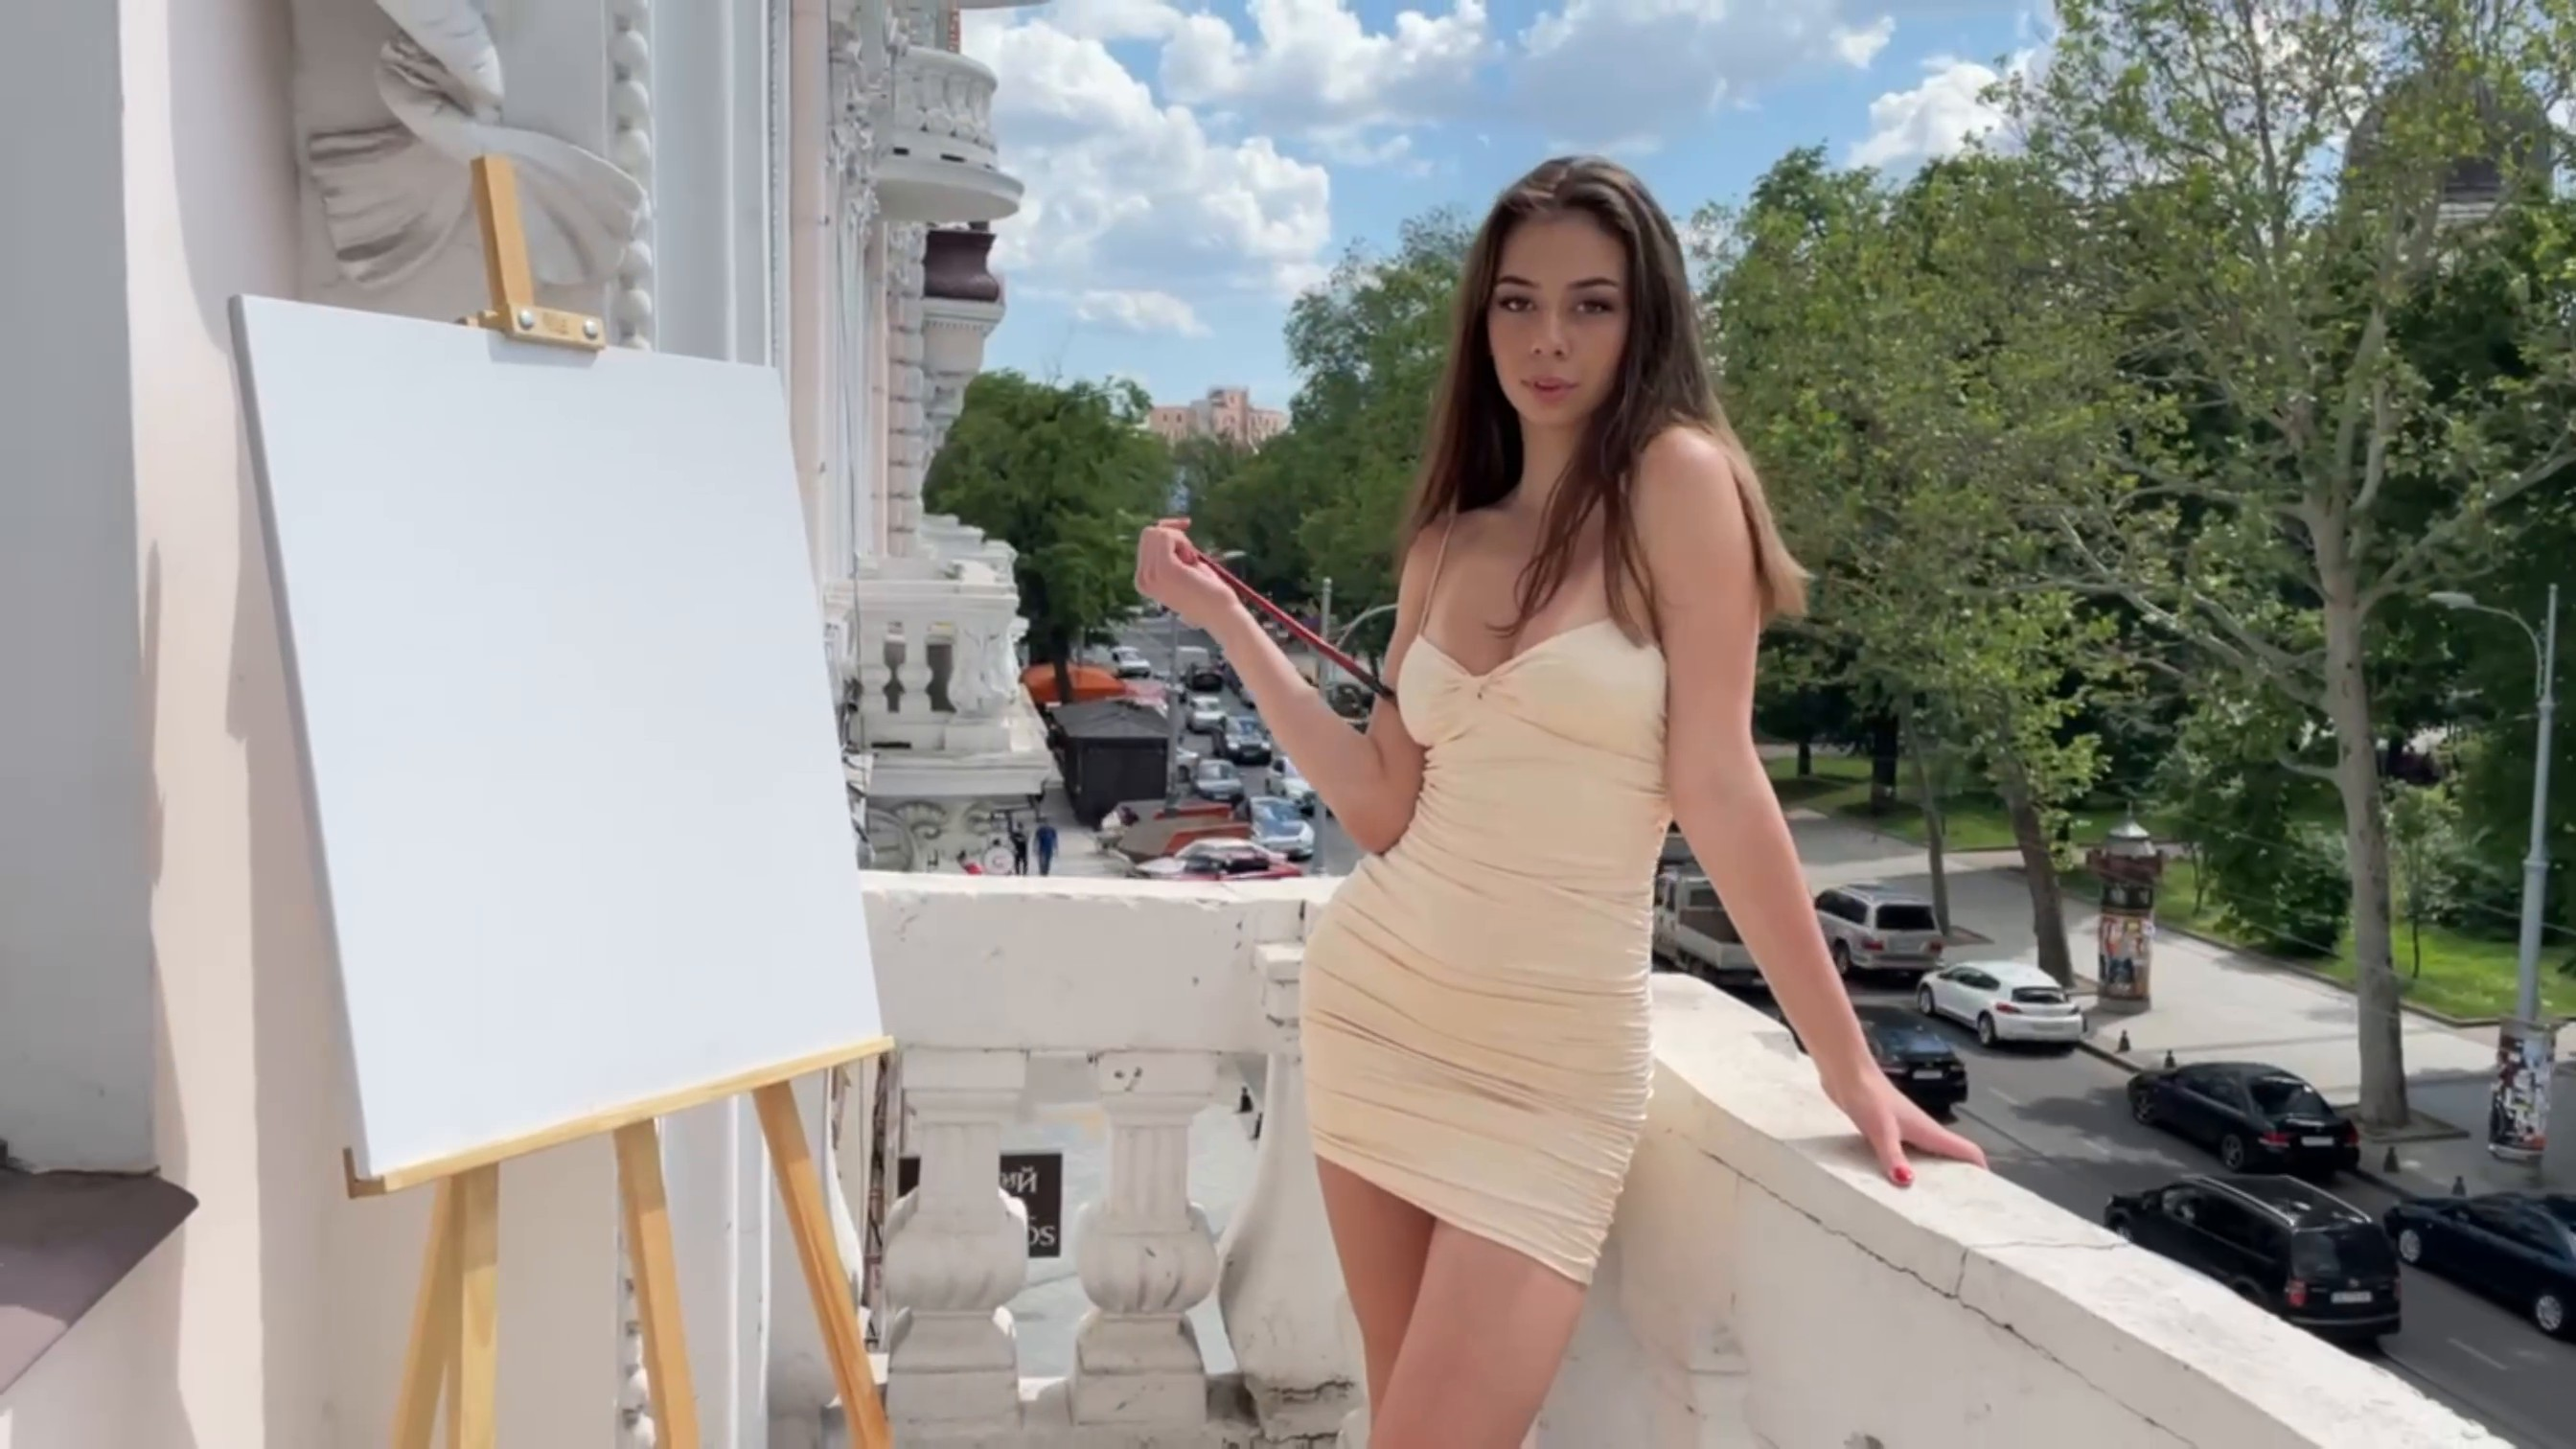 Sasha Nikolaev 19 y.o. - intelligent lady - small public photo.